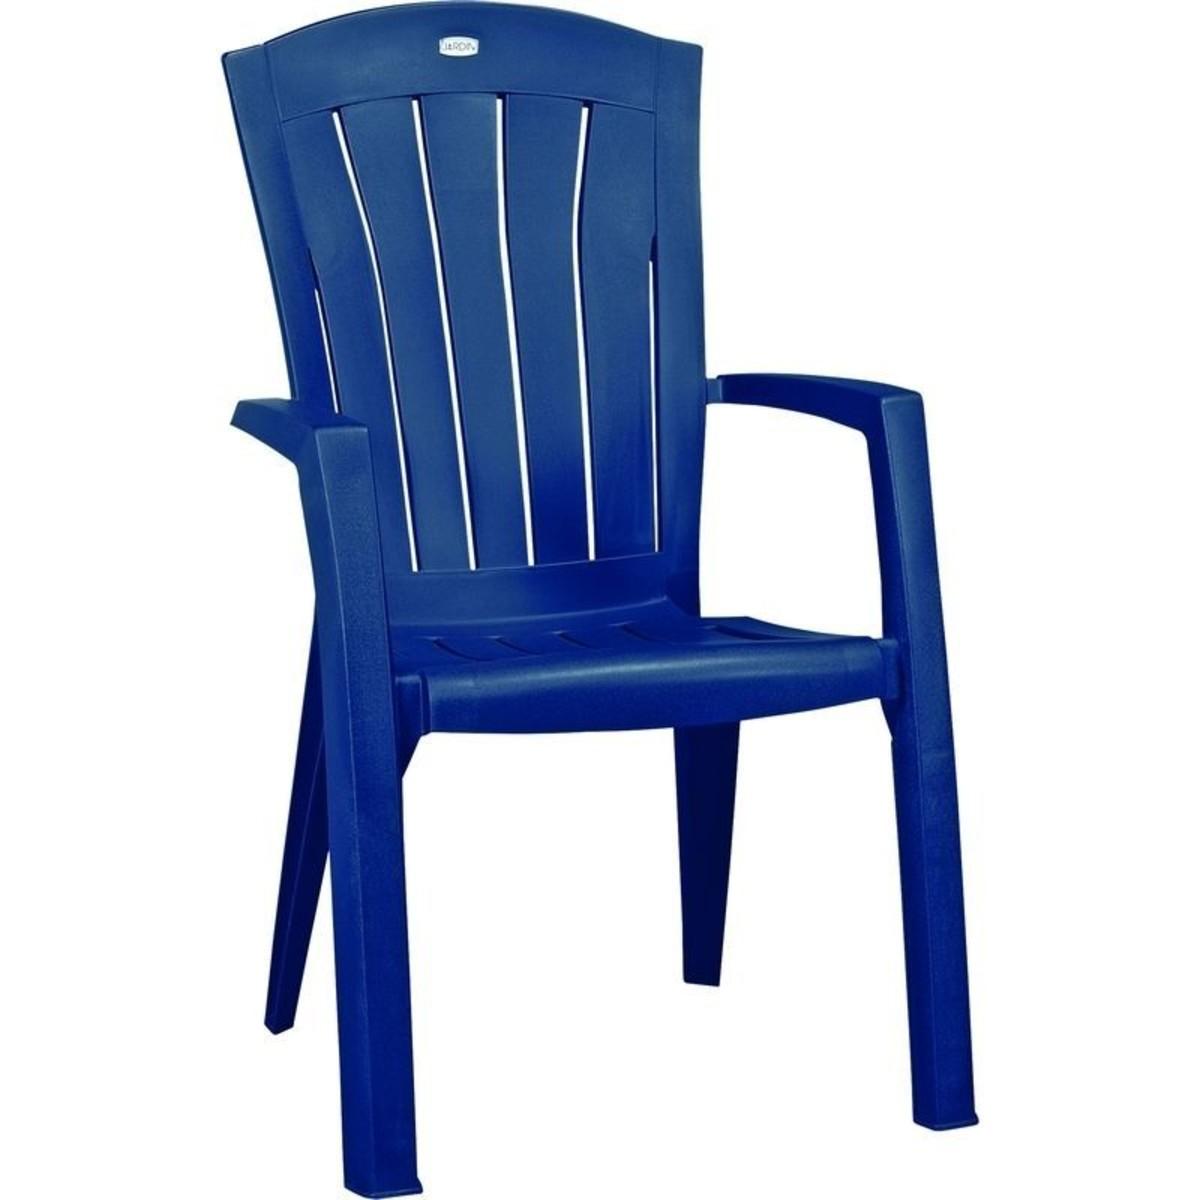 Кресло Садовое Санторини Синее 610x990x650 Пластик